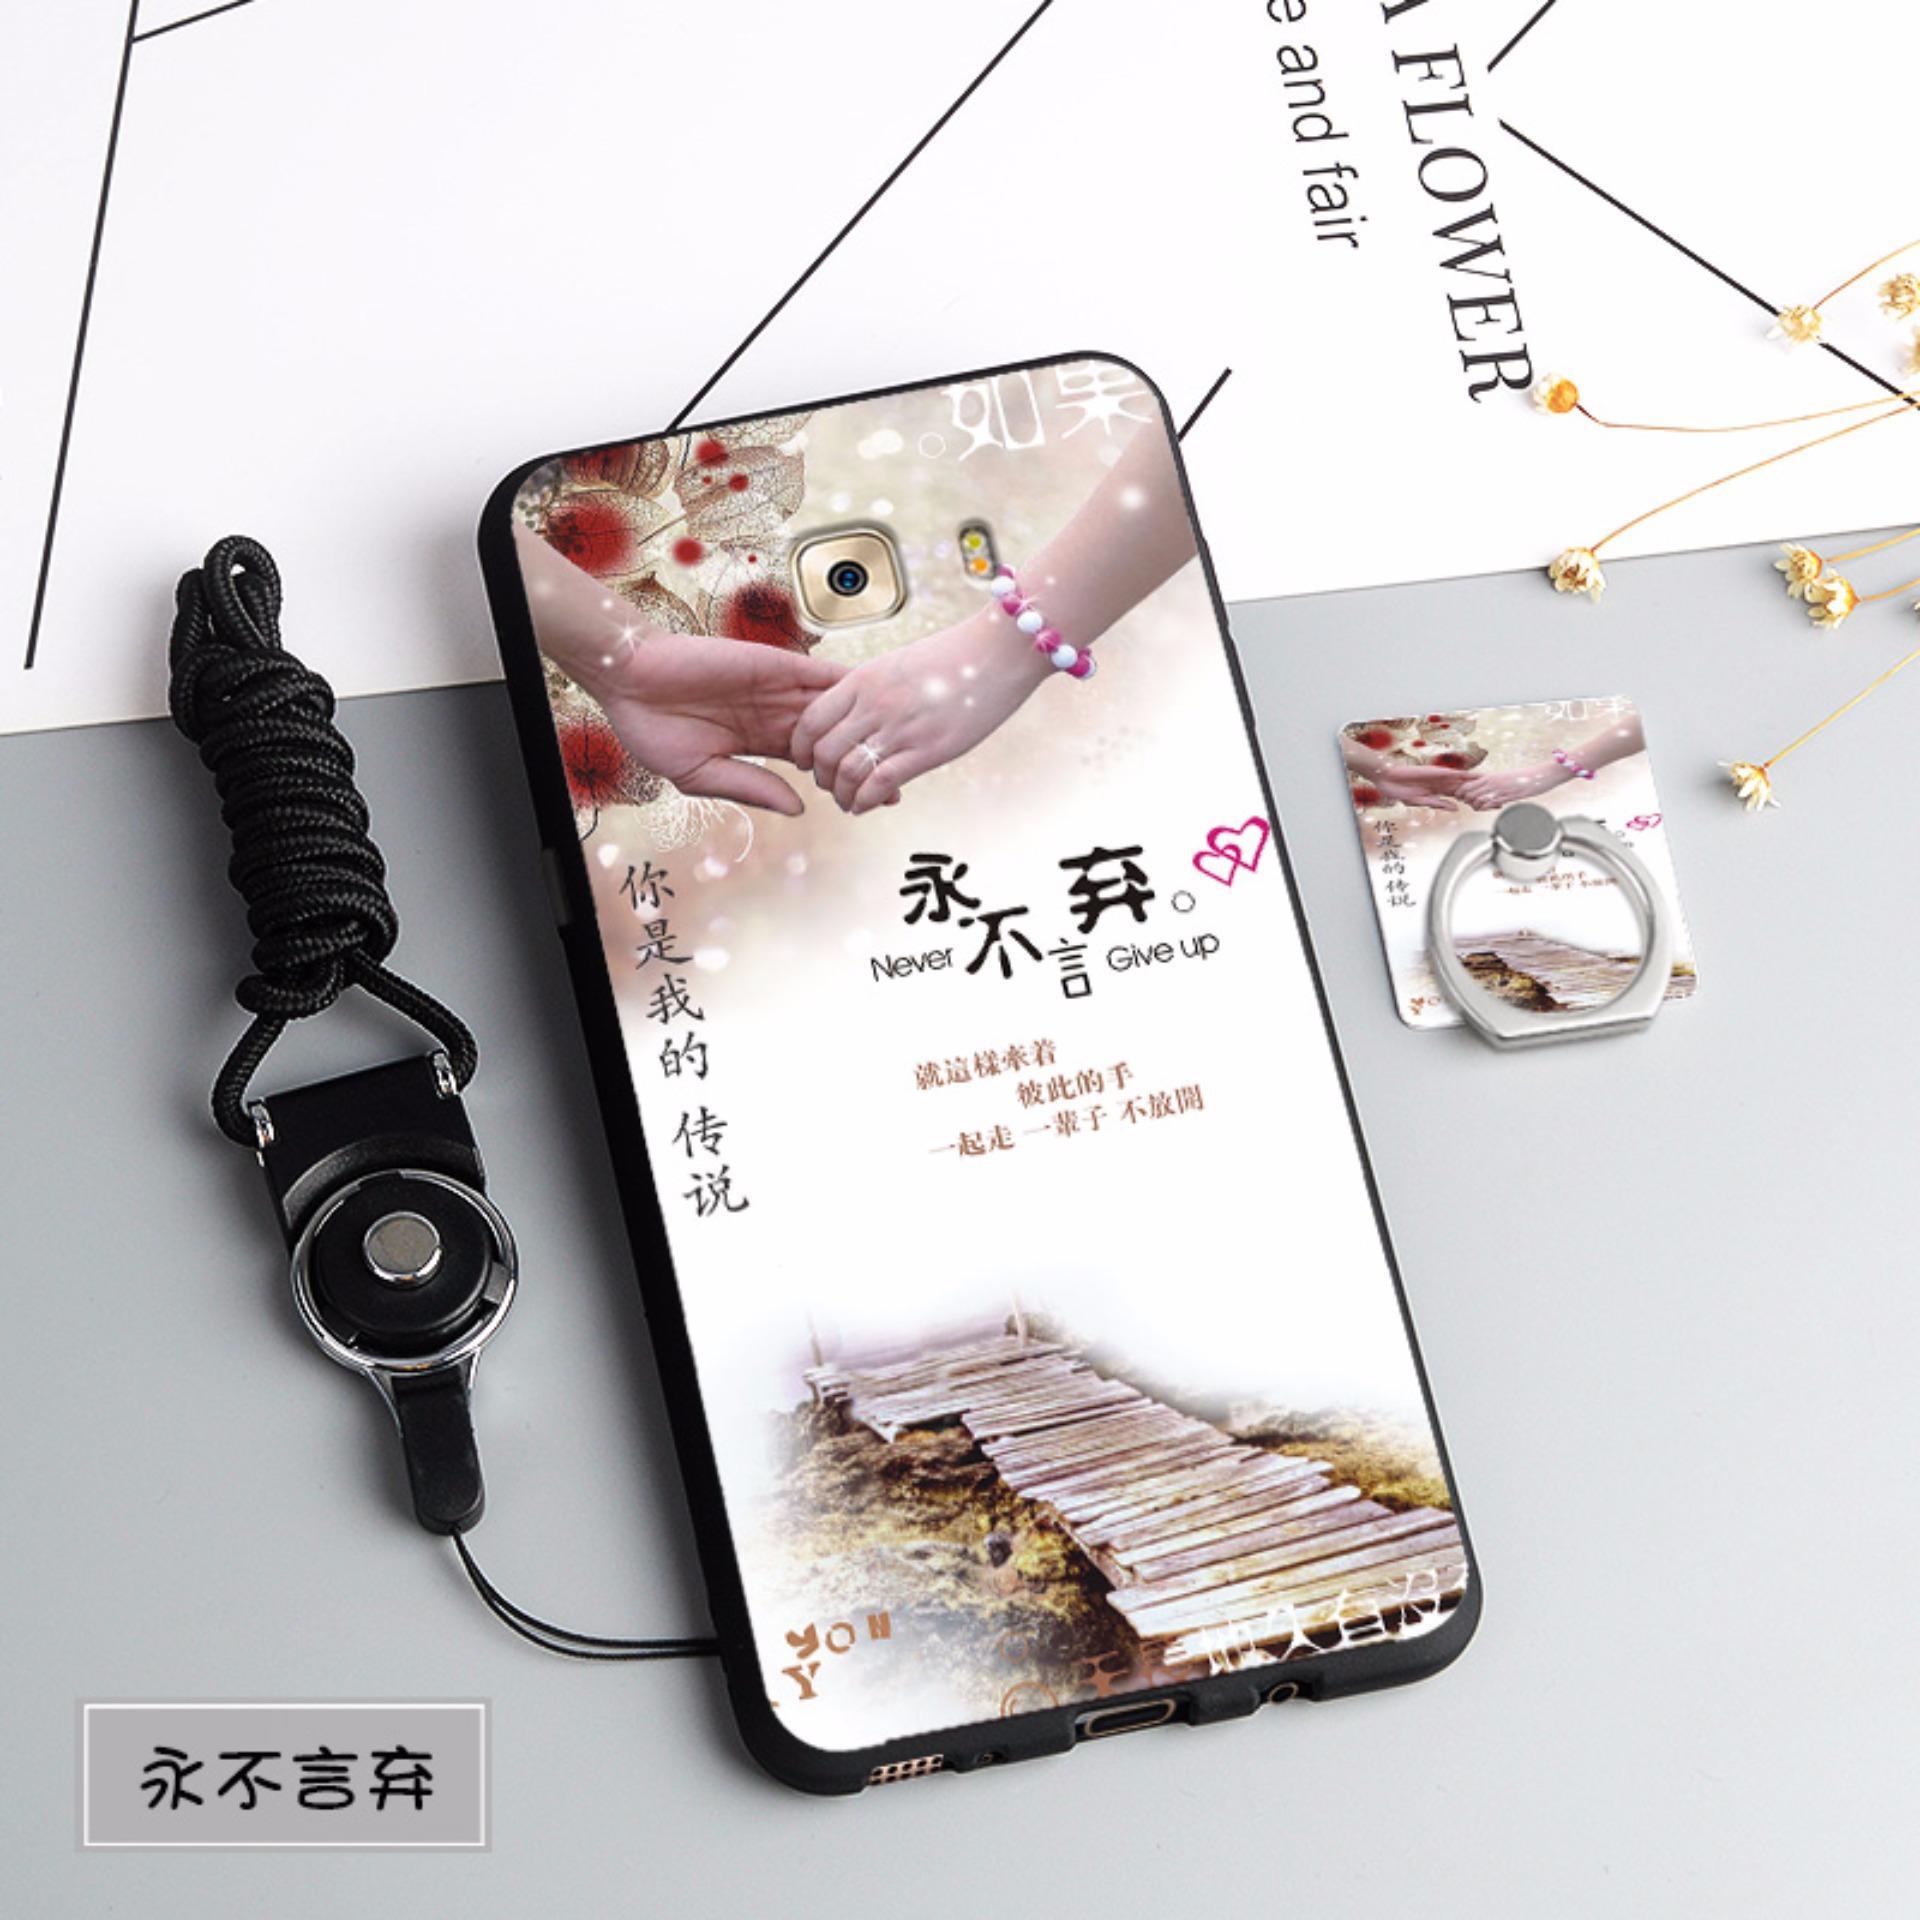 Silica Gel Soft Phone Case for Samsung Galaxy C9 Pro (Multicolor) - intl